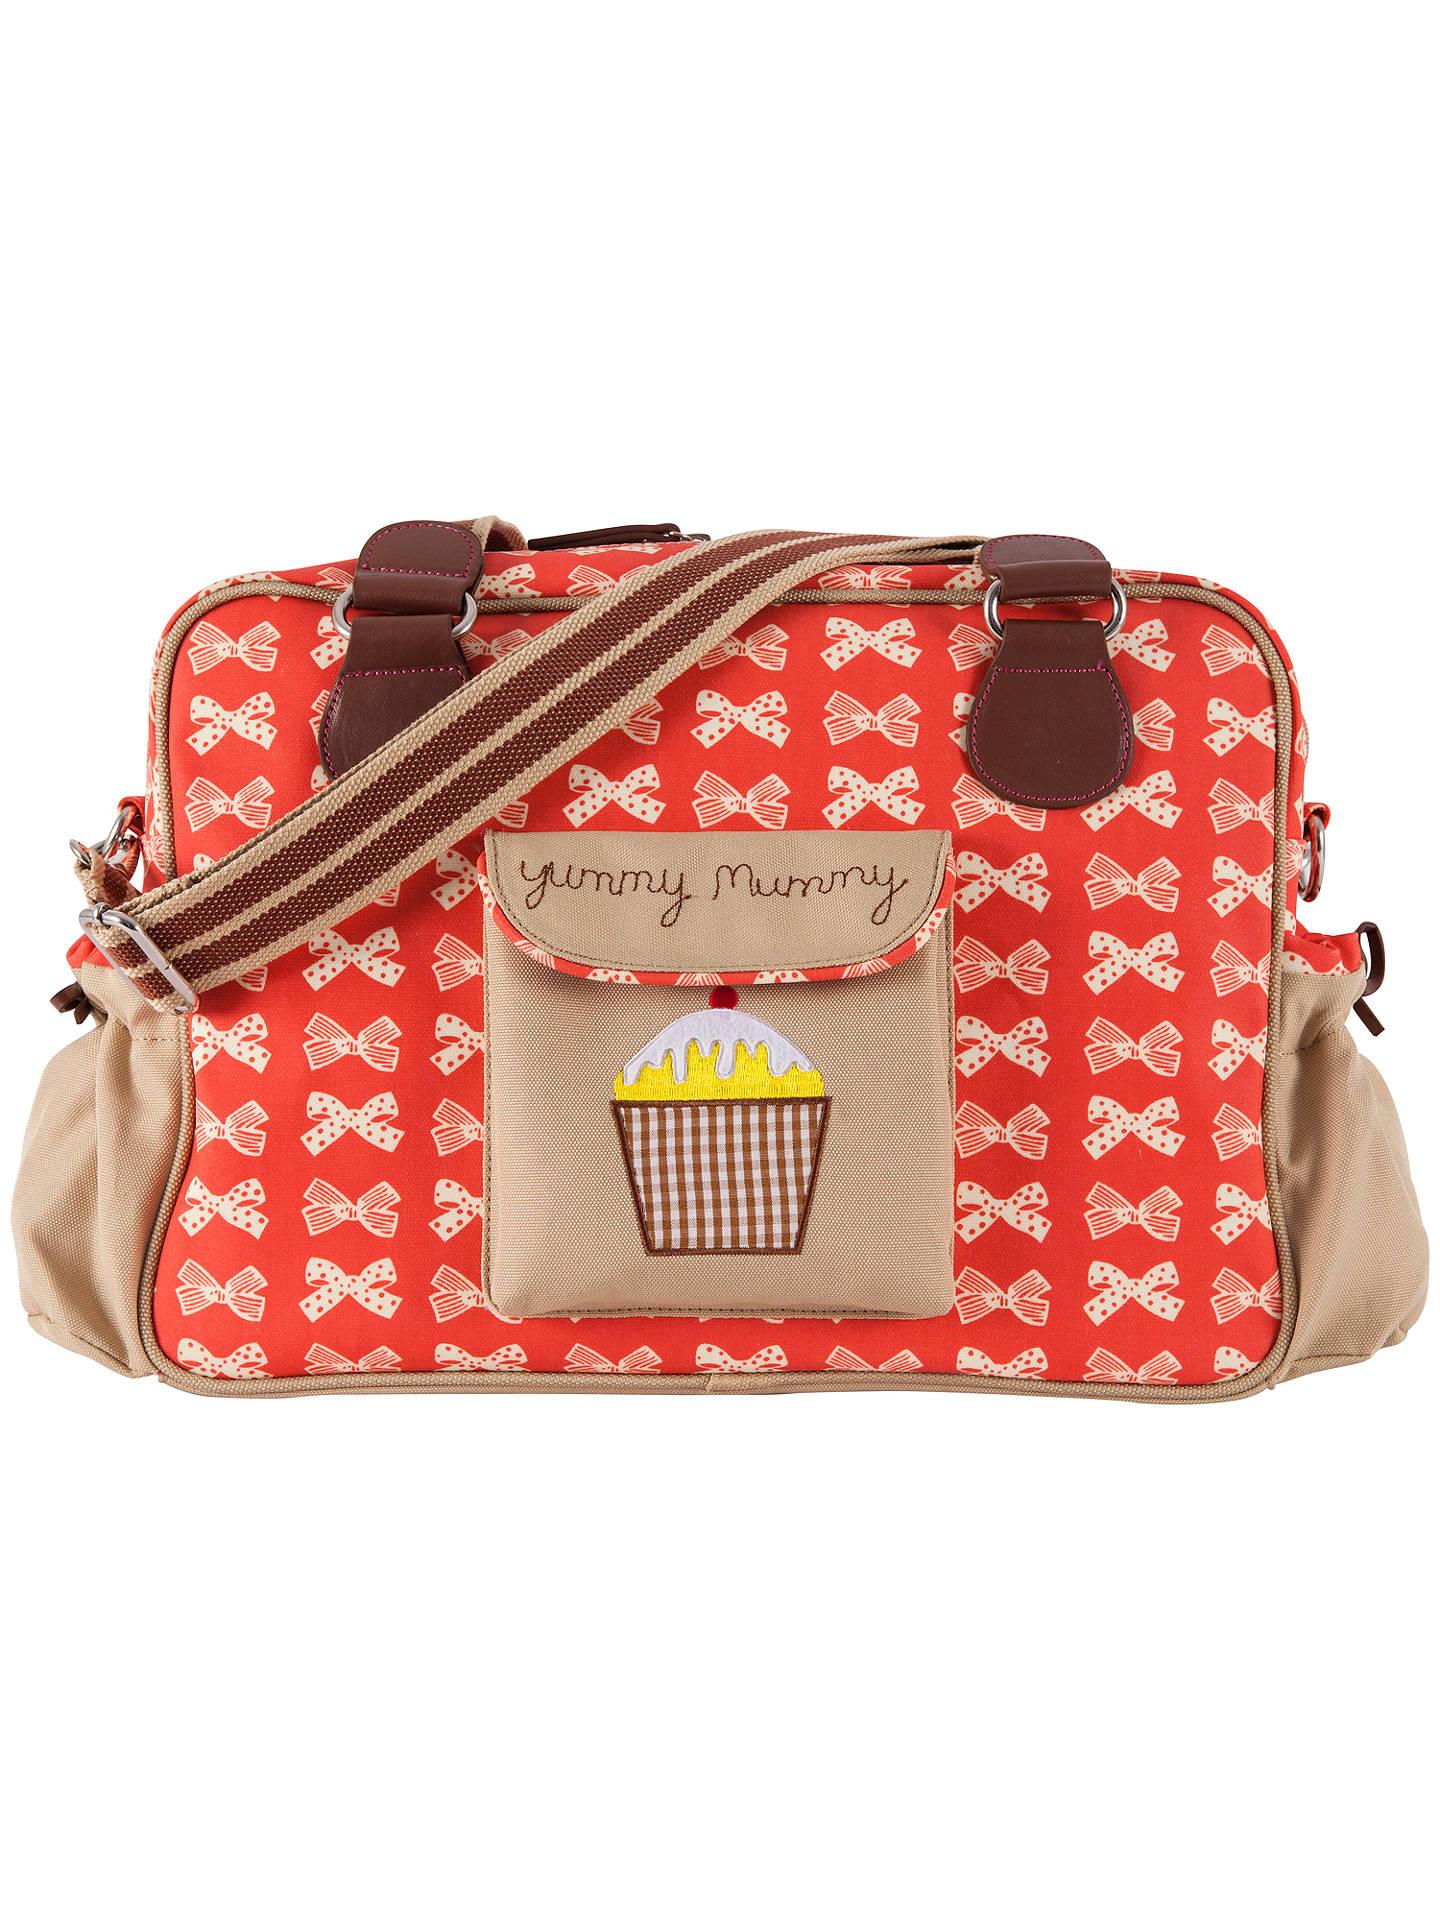 a7ffedb93a Buy Pink Lining Yummy Mummy Bow Print Changing Bag, Red/Cream Online at  johnlewis ...